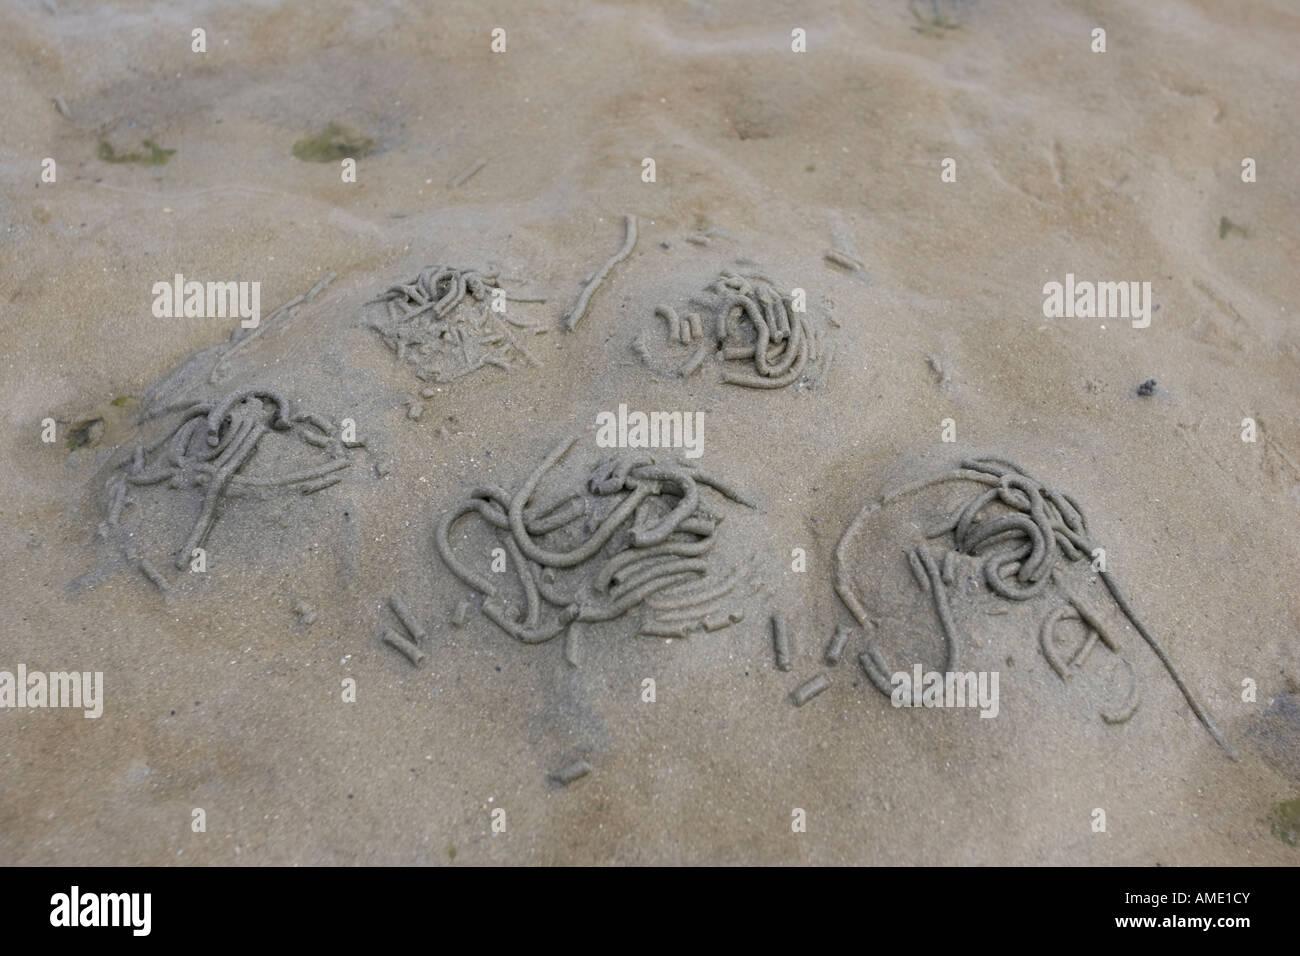 Lugworm casts on sandy beach Normandy France - Stock Image